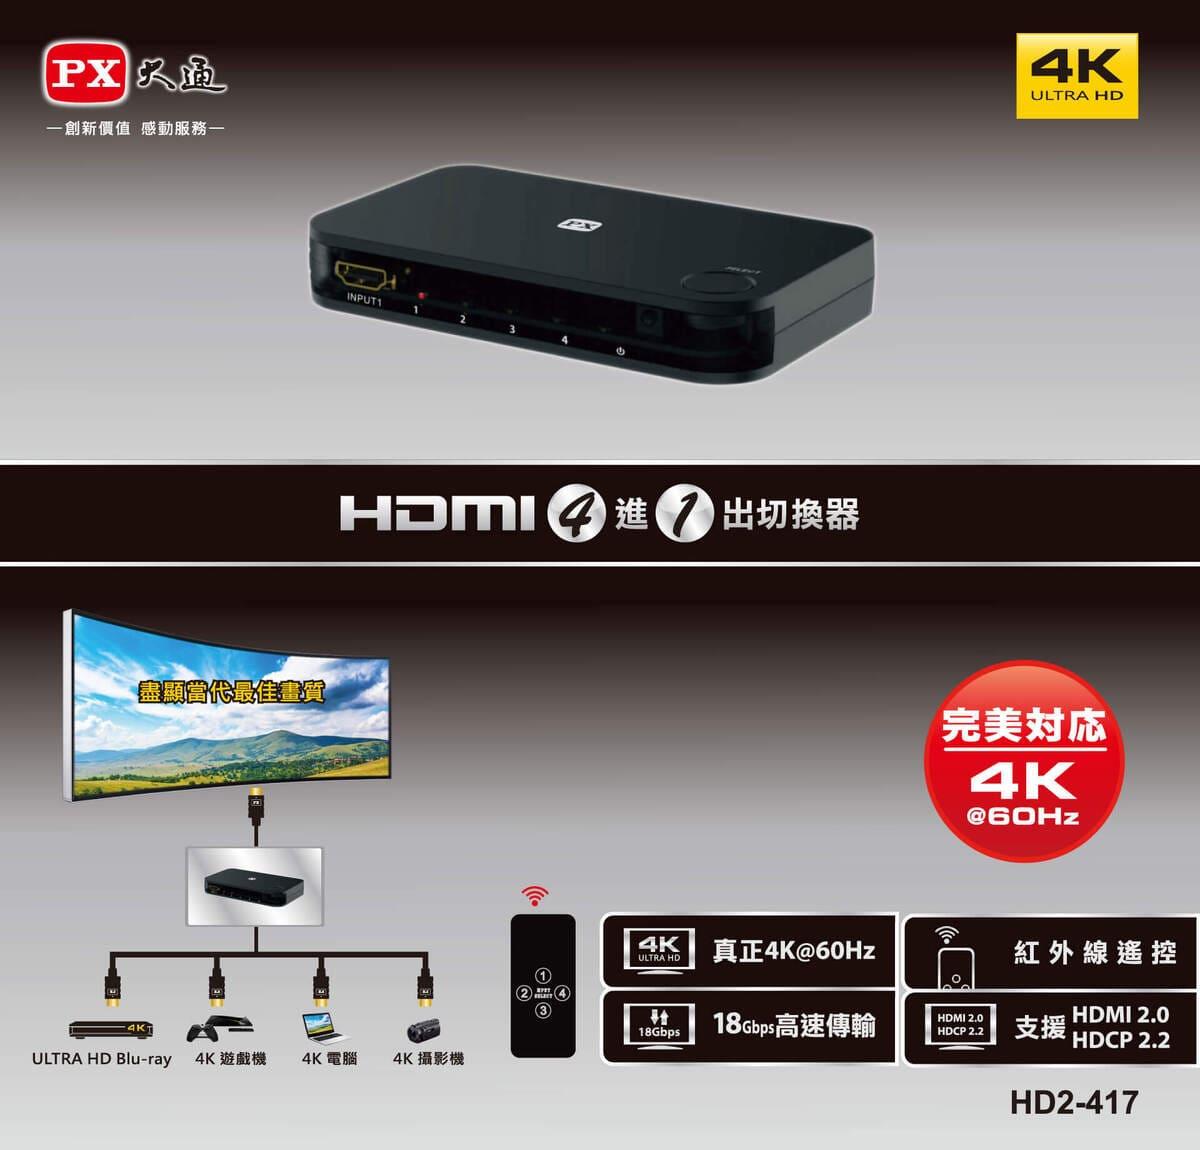 proimages/product/pro-02/pro02-002/HD2-417/HD2-417-3.jpg